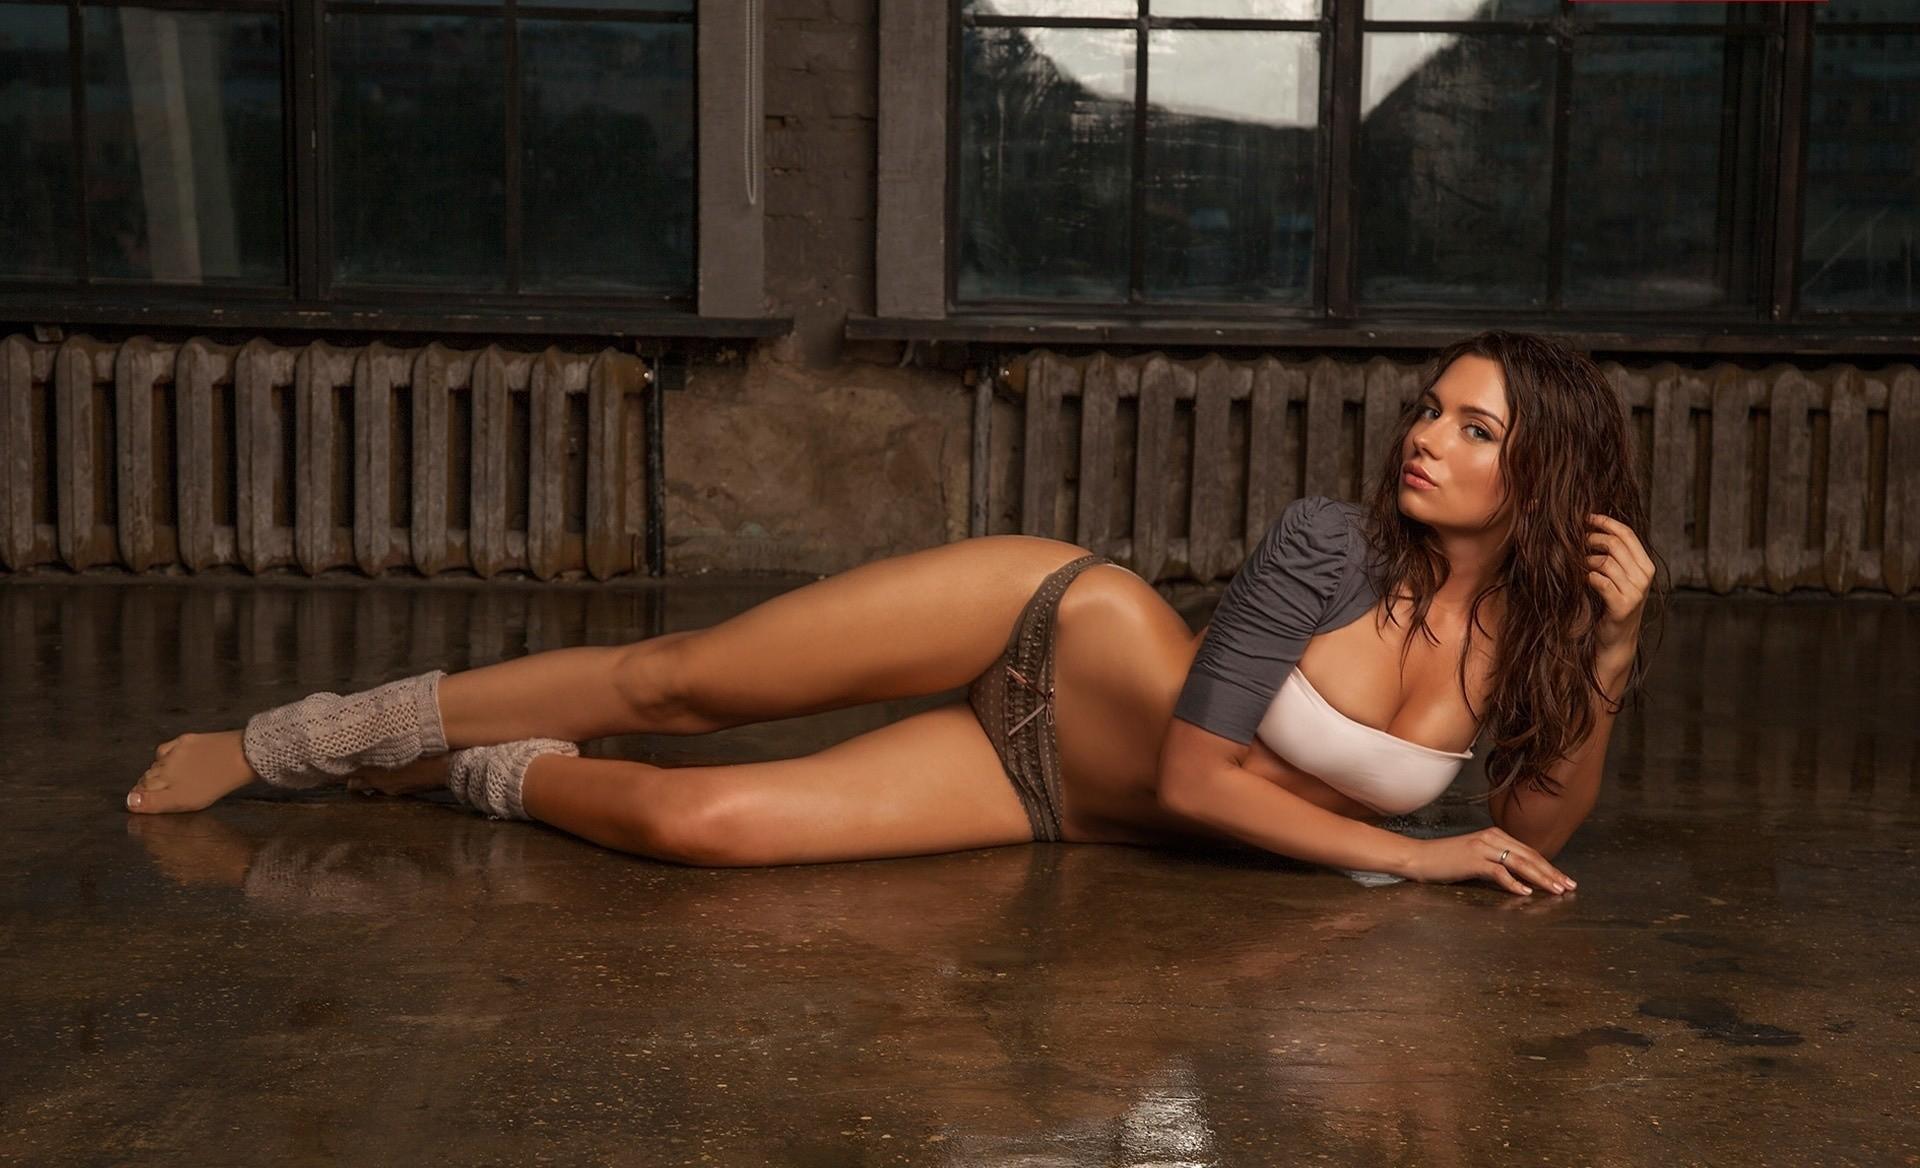 Julia volkova nude leaked photos nude celebrity photos